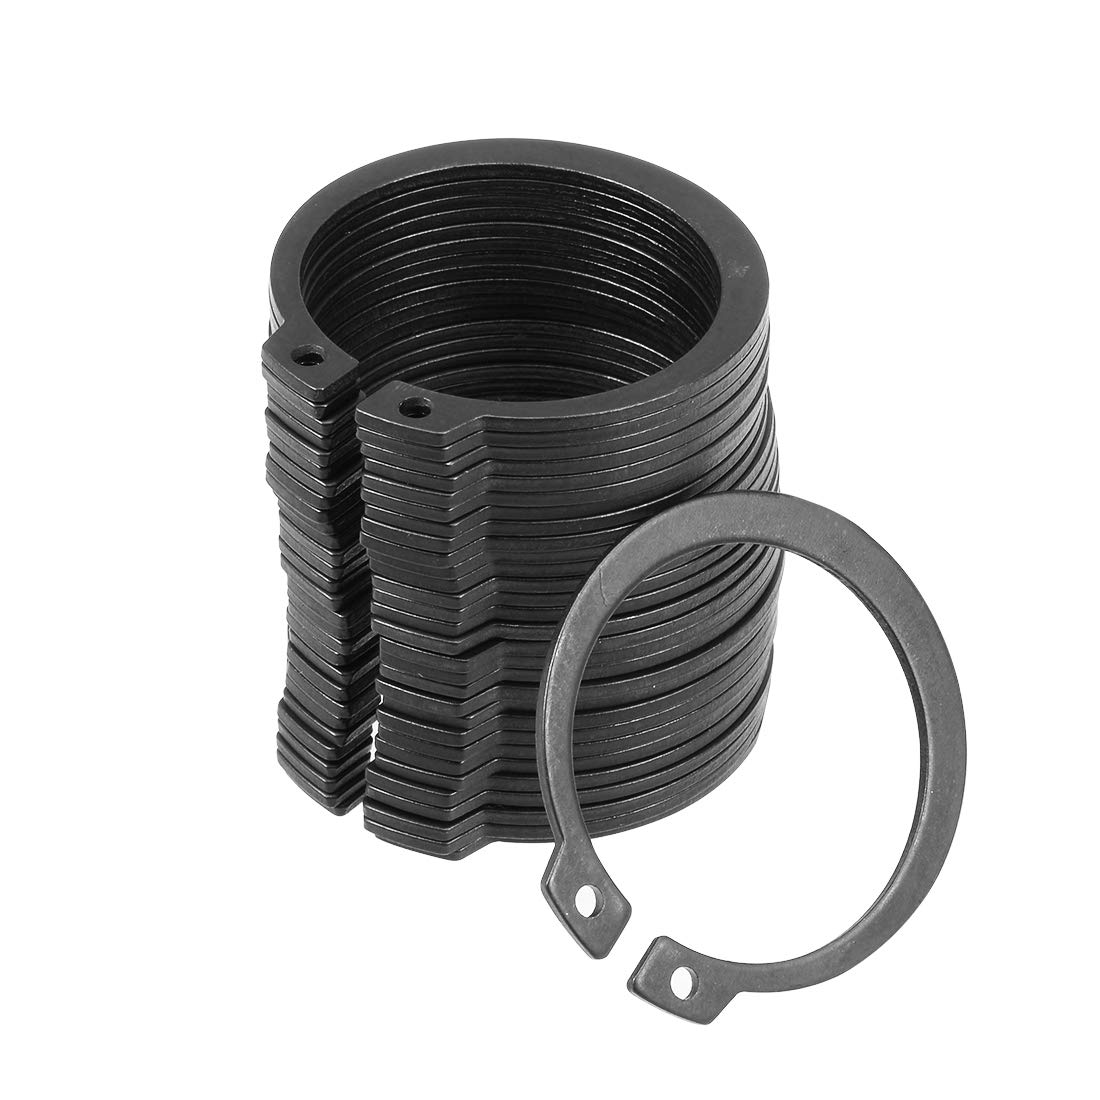 uxcell 41mm External Circlips C-Clip Retaining Shaft Snap Rings 65Mn 30pcs